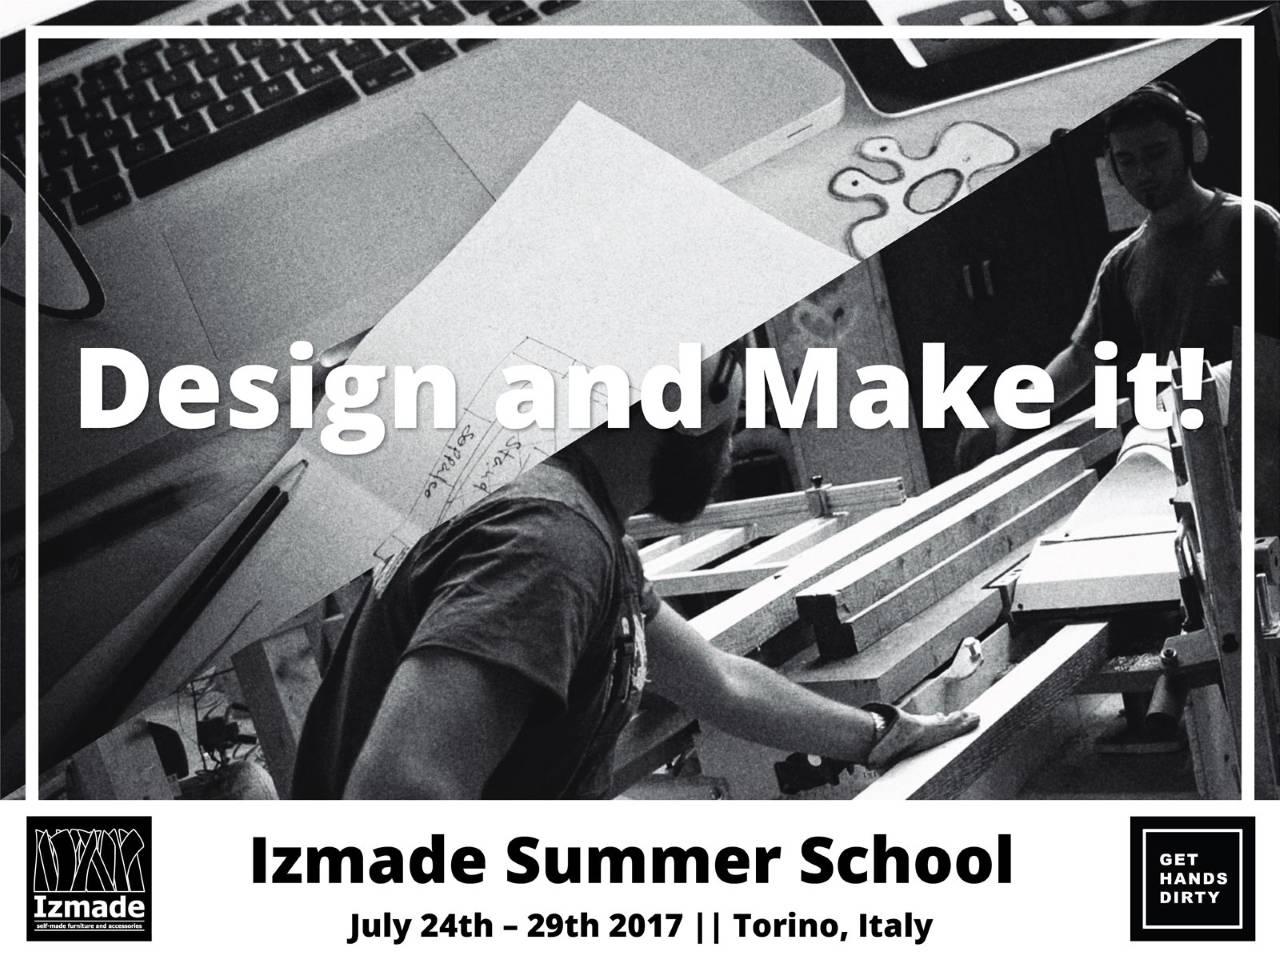 Izmade Curso de Verano 1027: Design and make it!, Turín, Italia : Poster © Izmade